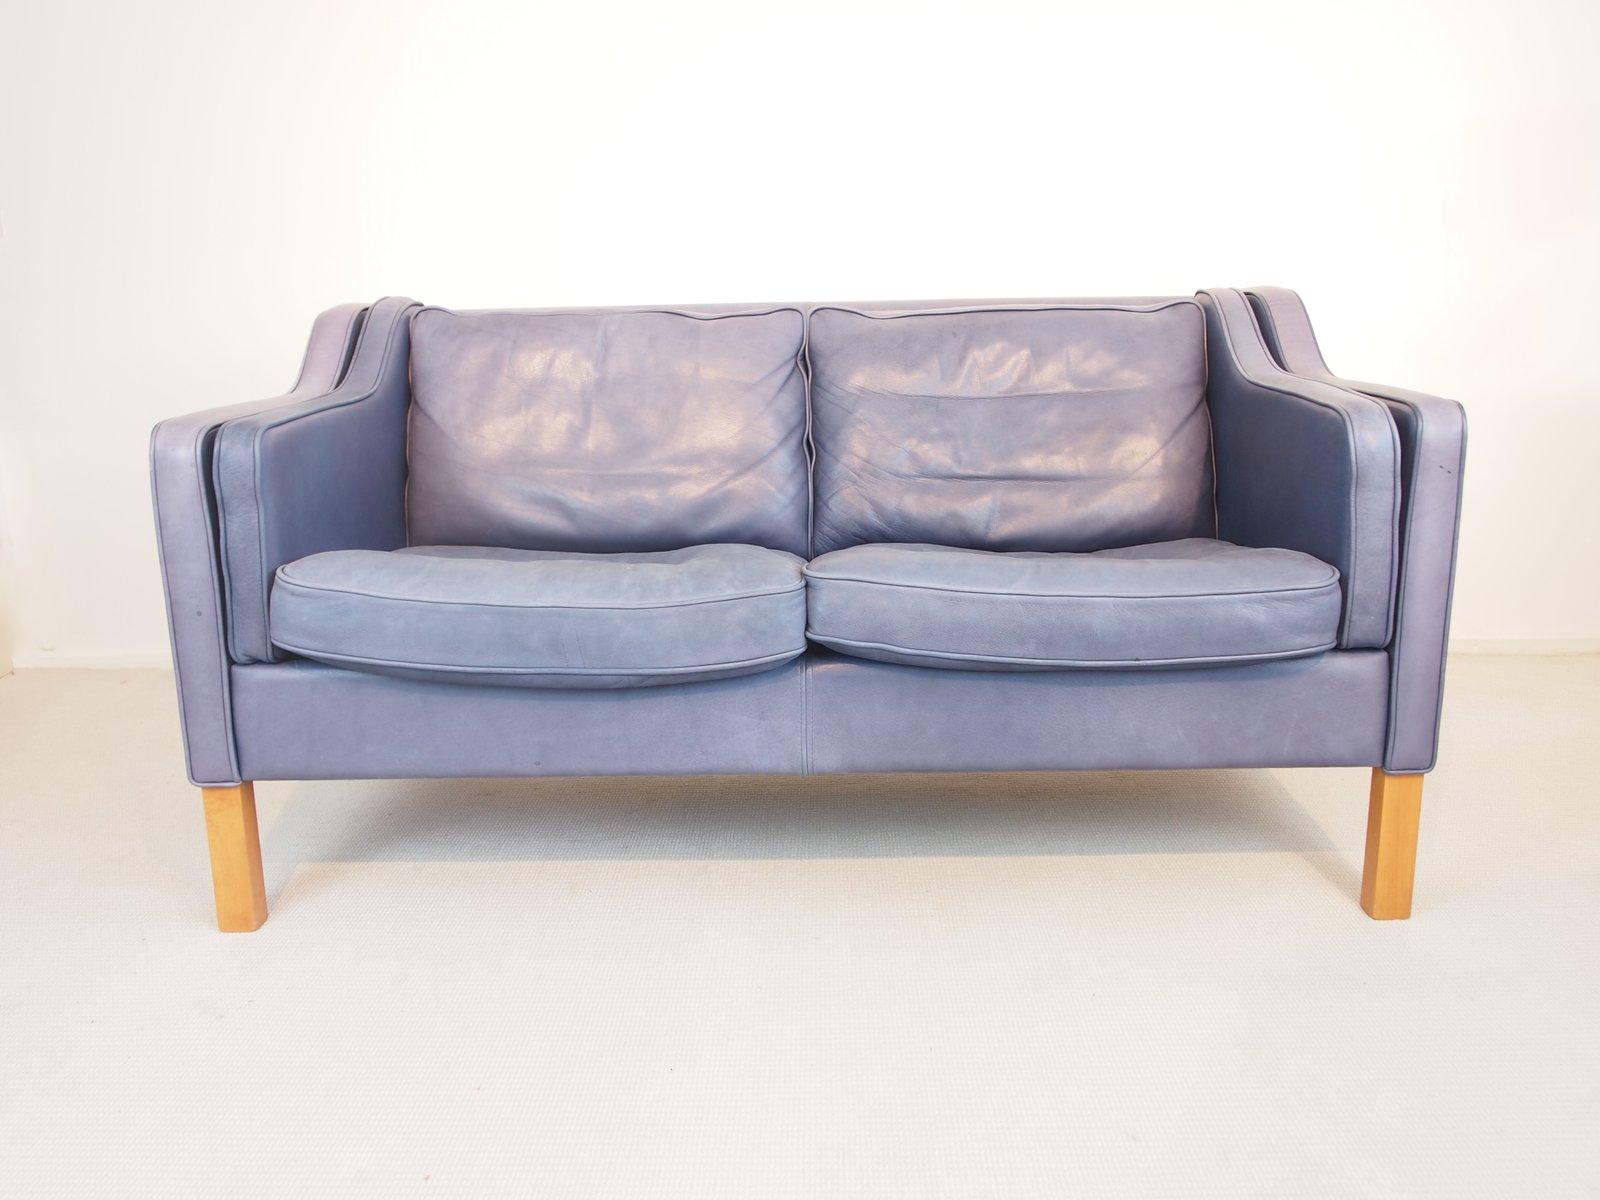 Bezaubernd Hellblaues Sofa Beste Wahl Blaues Vintage Anilin Von Georg Thams